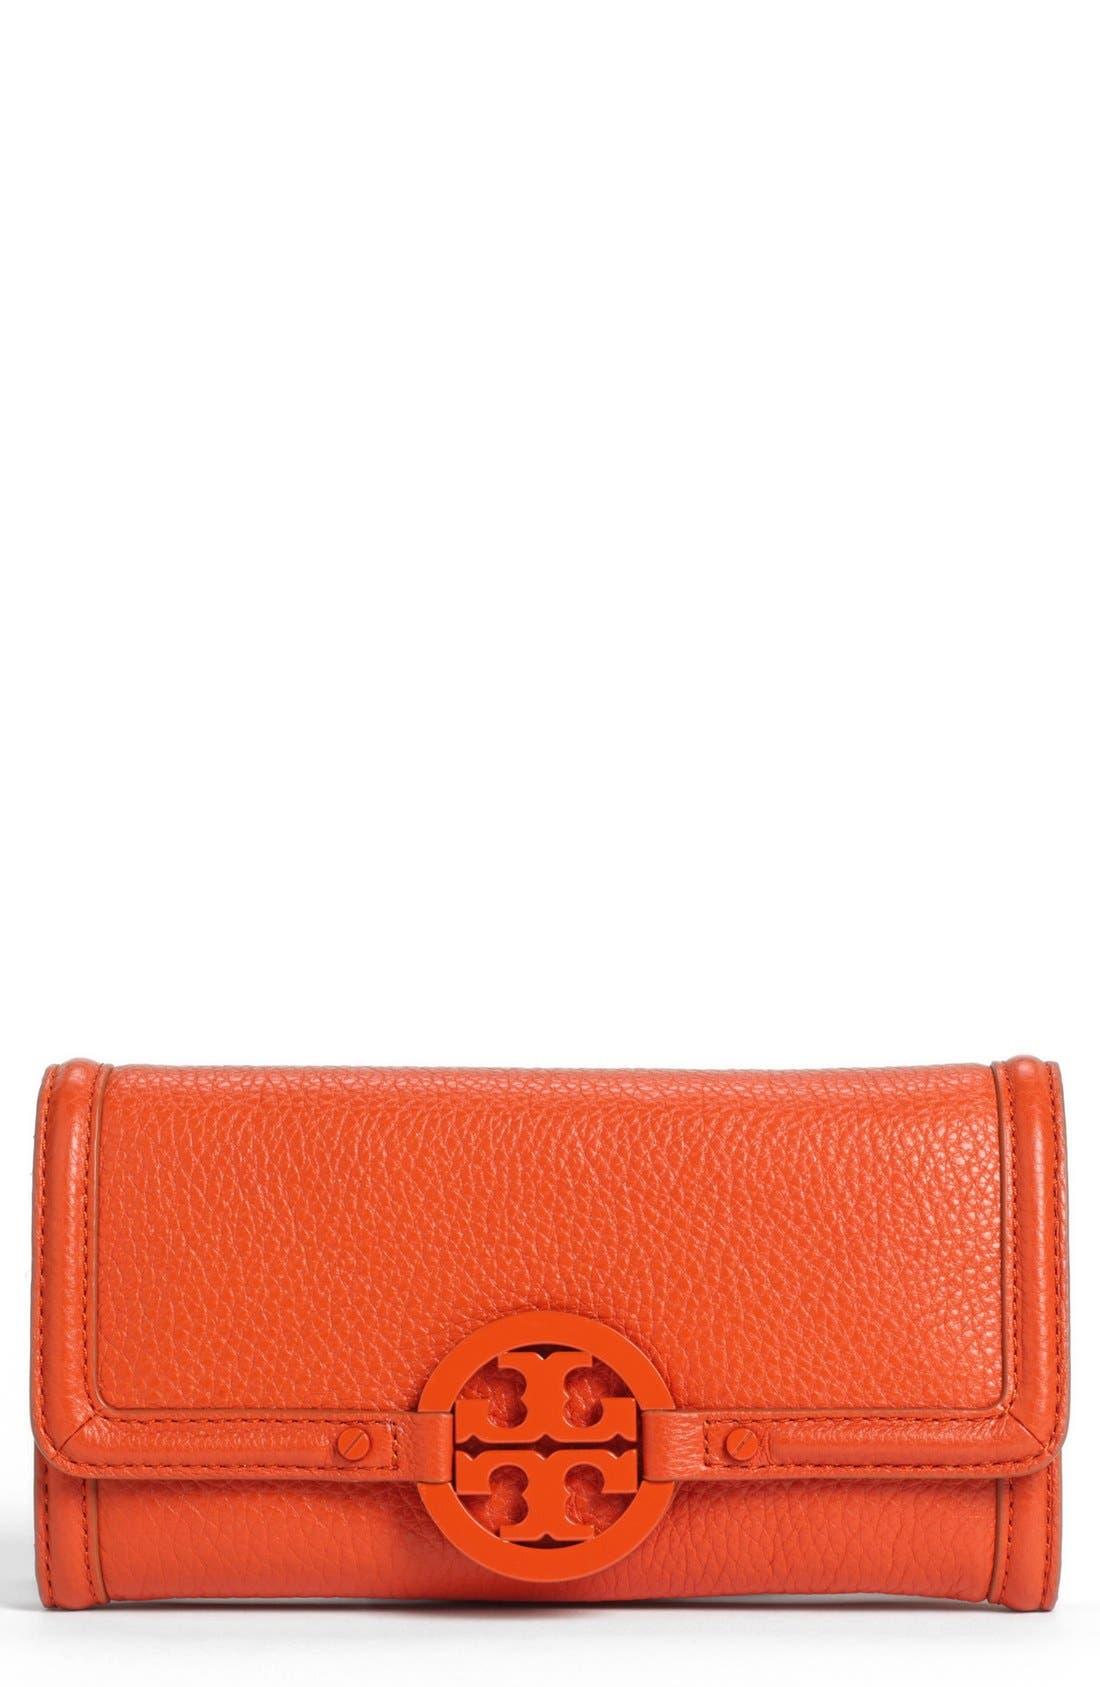 Alternate Image 1 Selected - Tory Burch 'Amanda' Continental Envelope Wallet